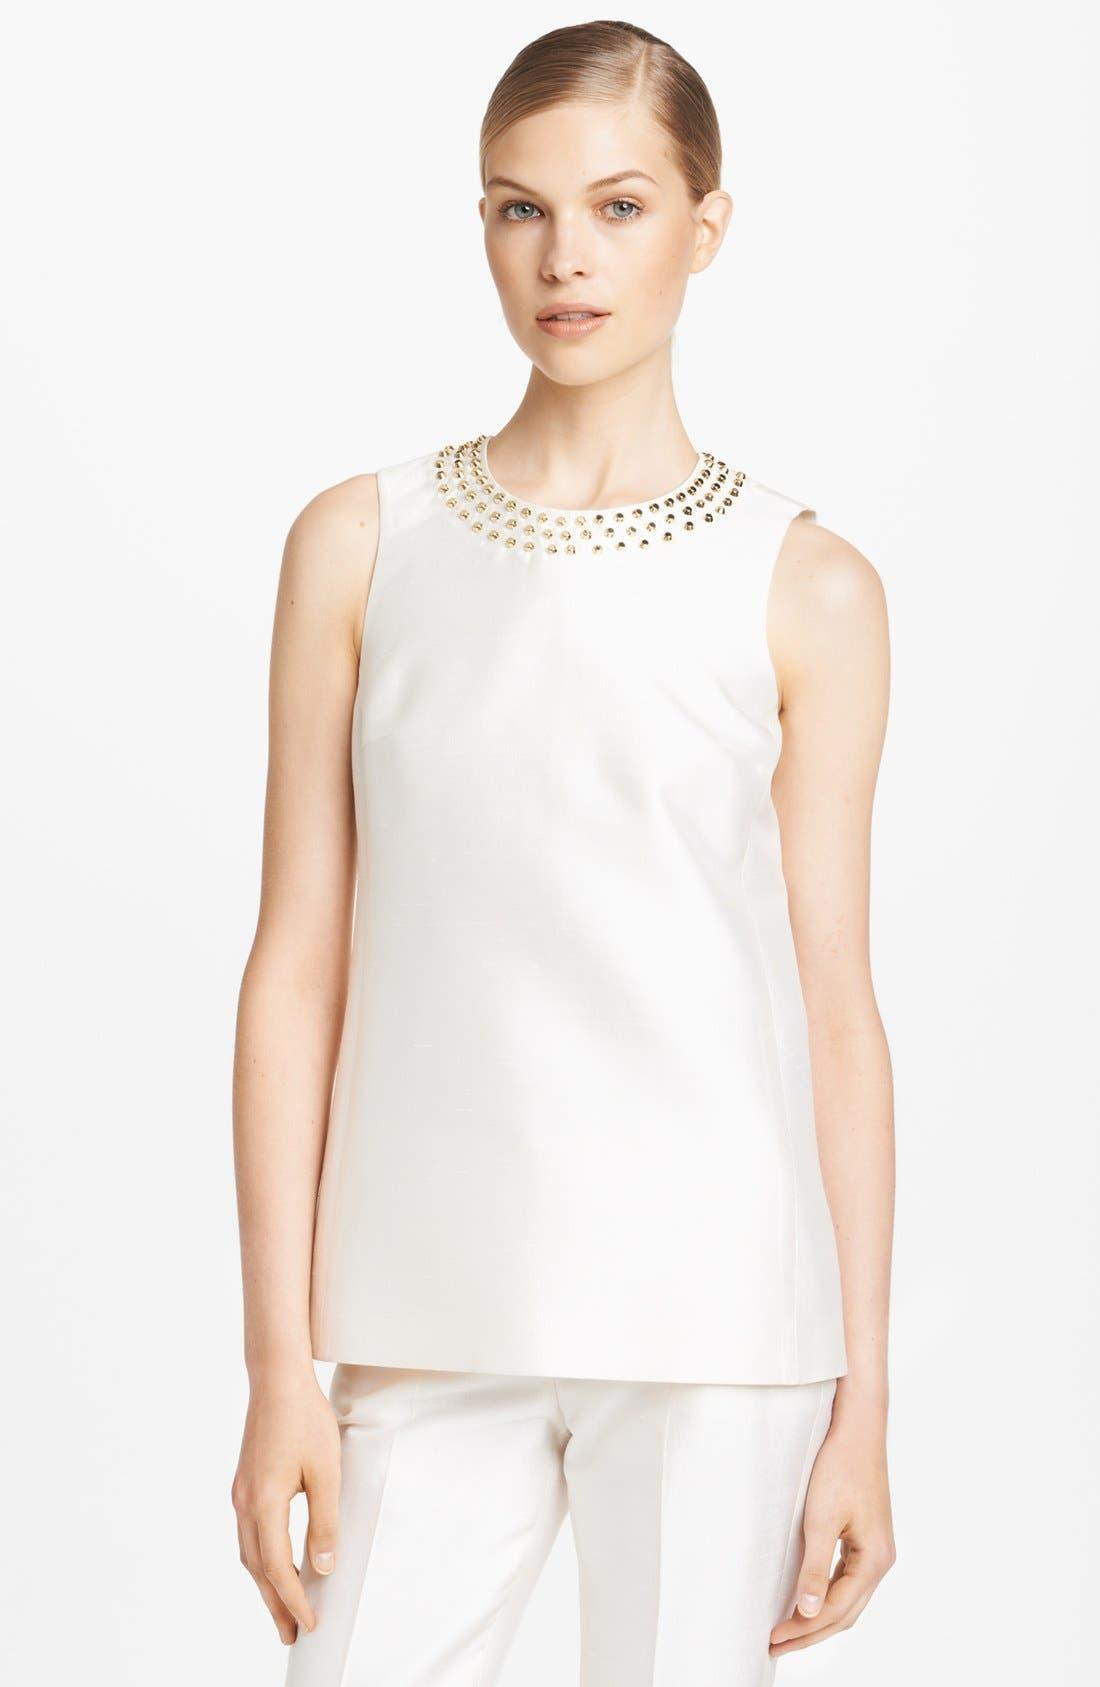 Alternate Image 1 Selected - Michael Kors Studded Silk & Wool Top